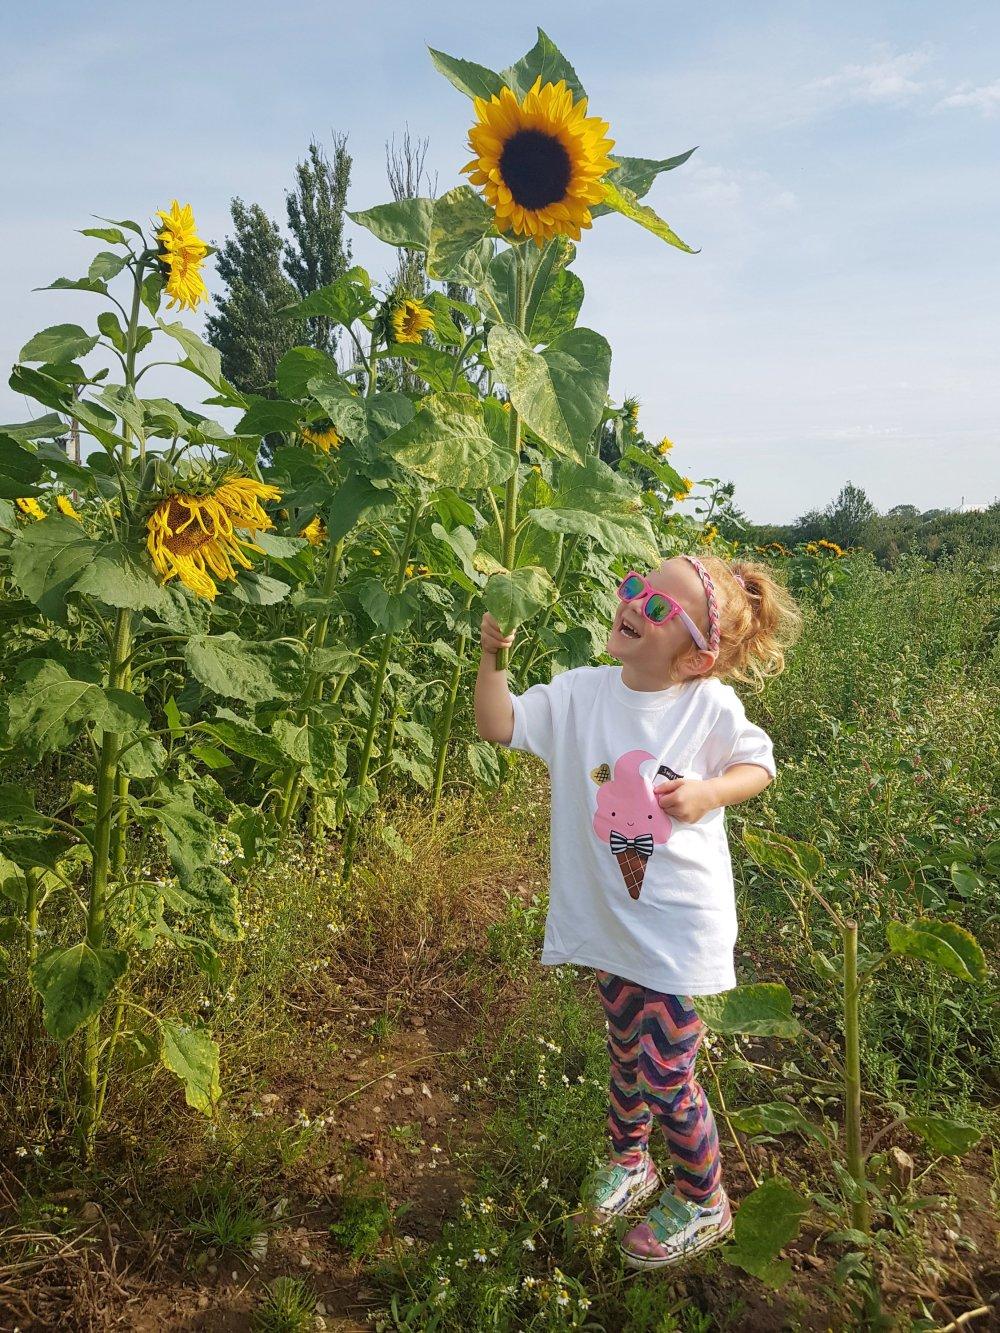 Enjoying choosing her own sunflowers